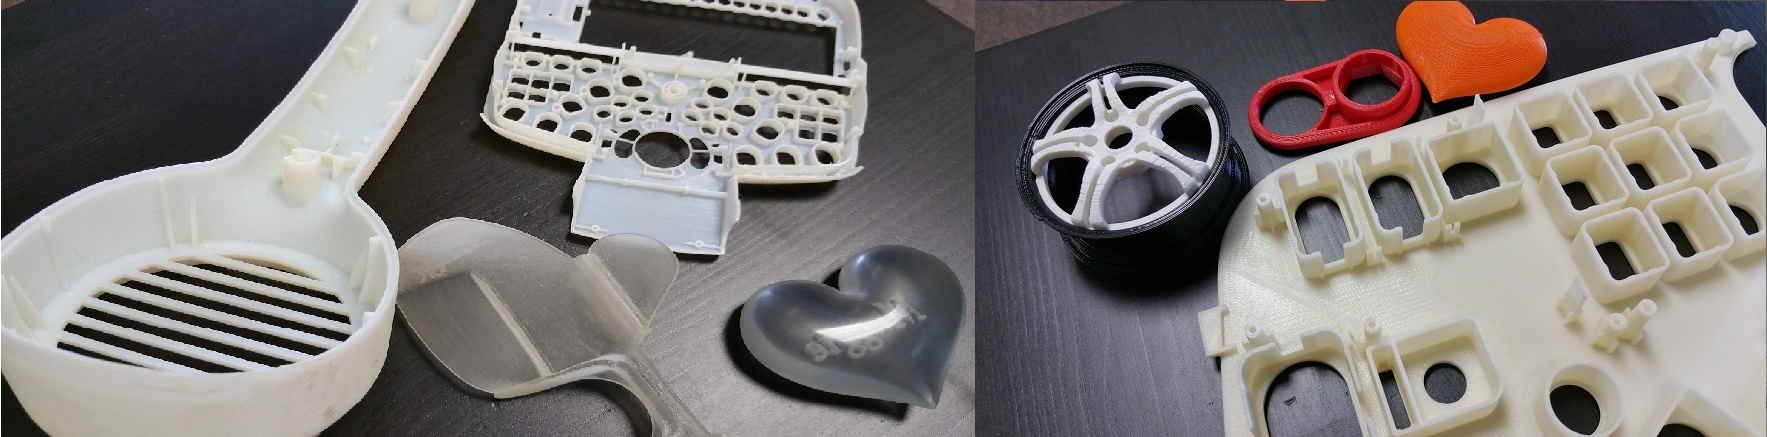 ABS and Polyjet 3D printed parts